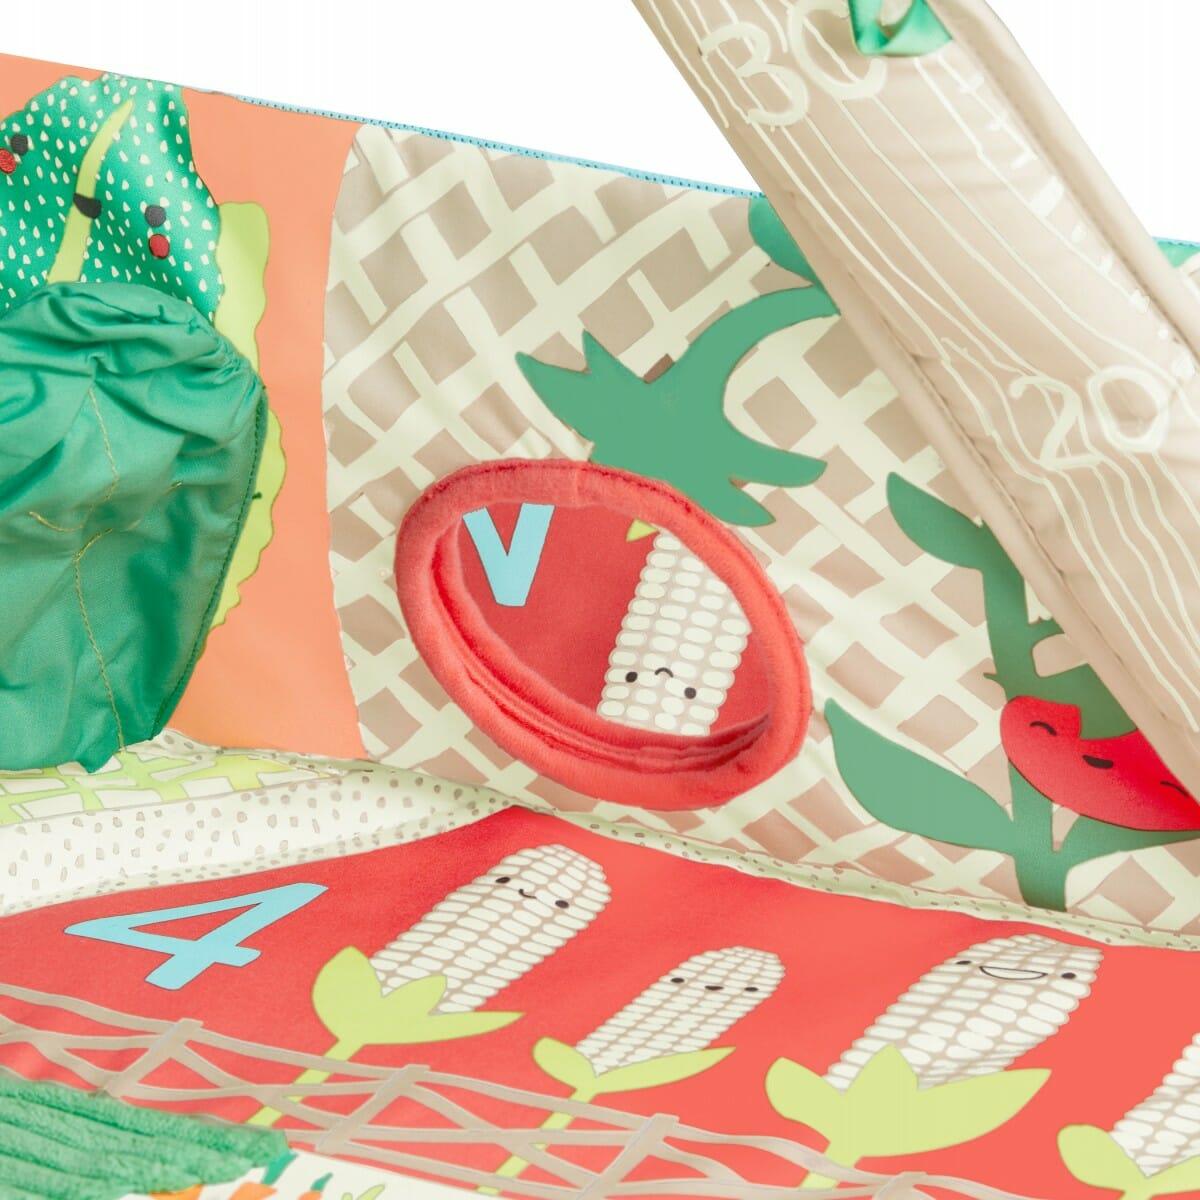 Skip Hop Farmstand Grow & Play Activity Gym Closeup